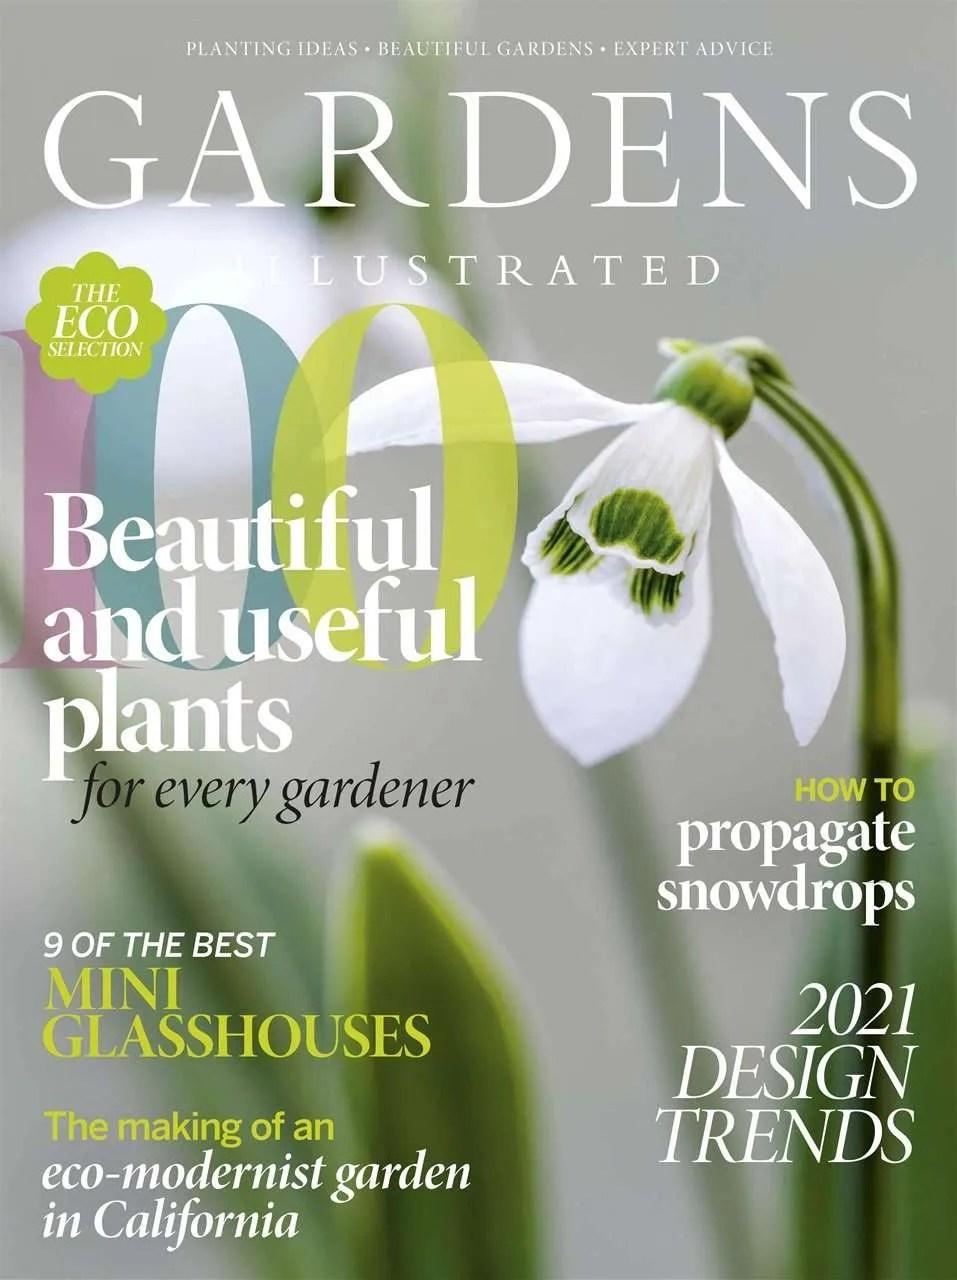 Gardens Illustrated 2021 Garden Design trends with designer Ann-Marie Powell